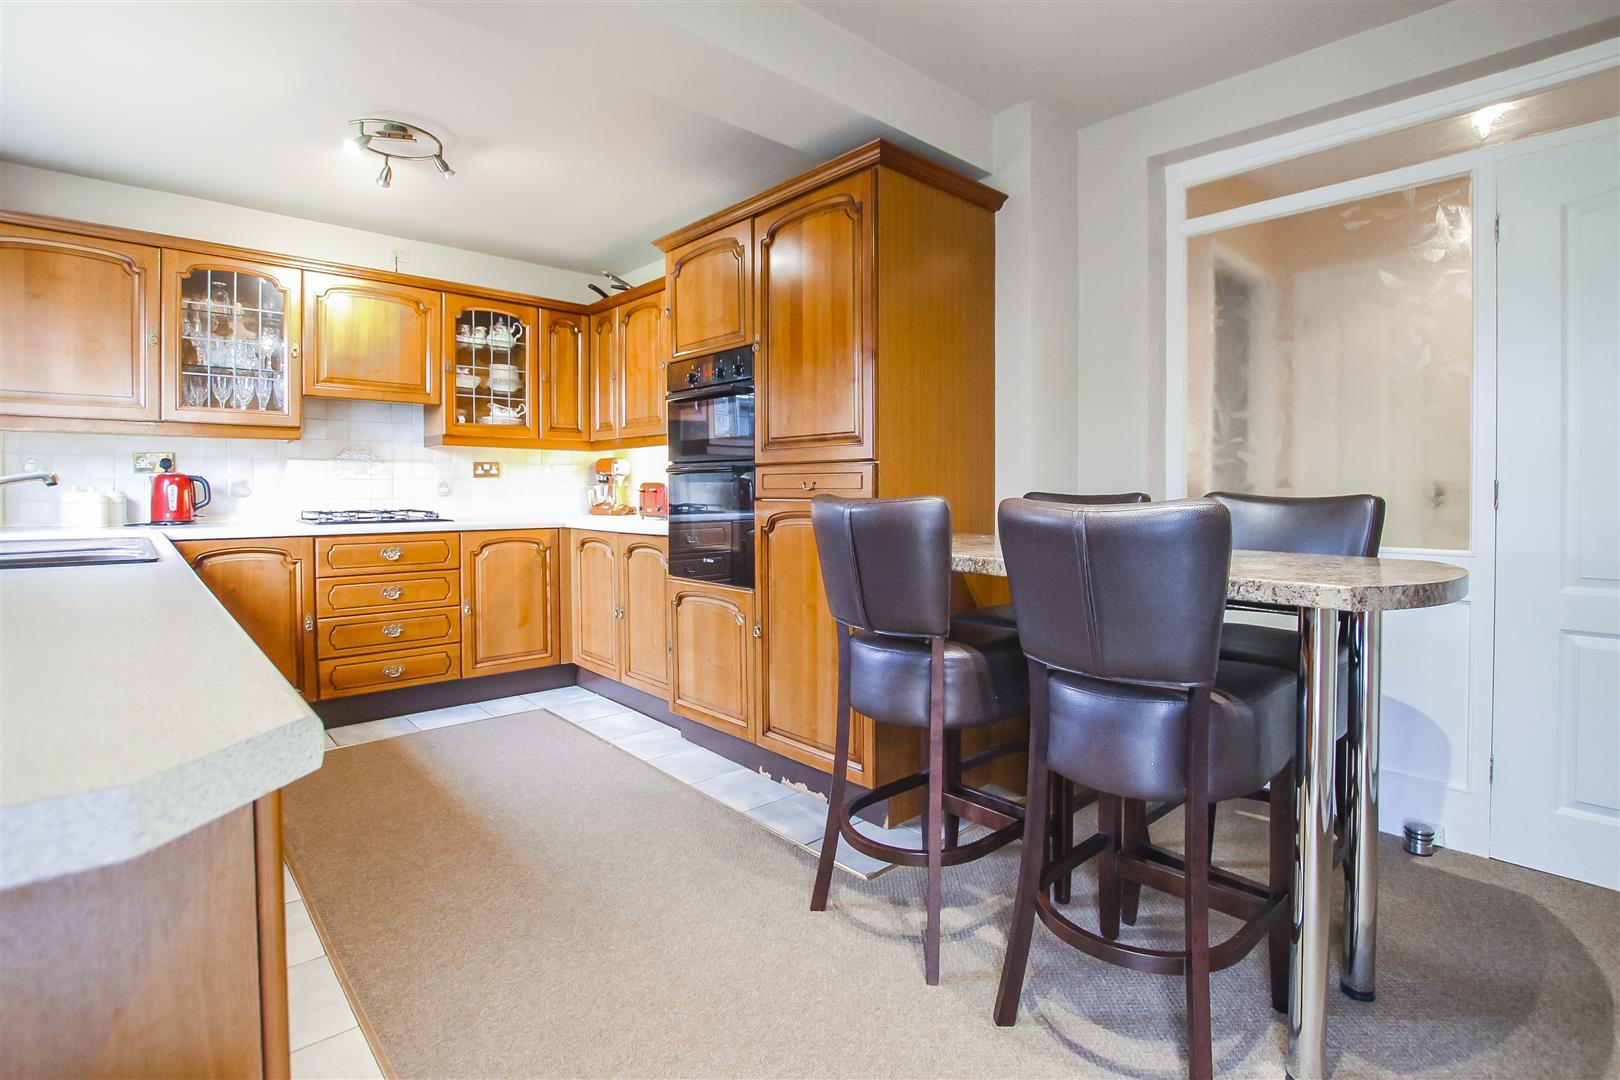 5 Bedroom Detached House For Sale - Kitchen